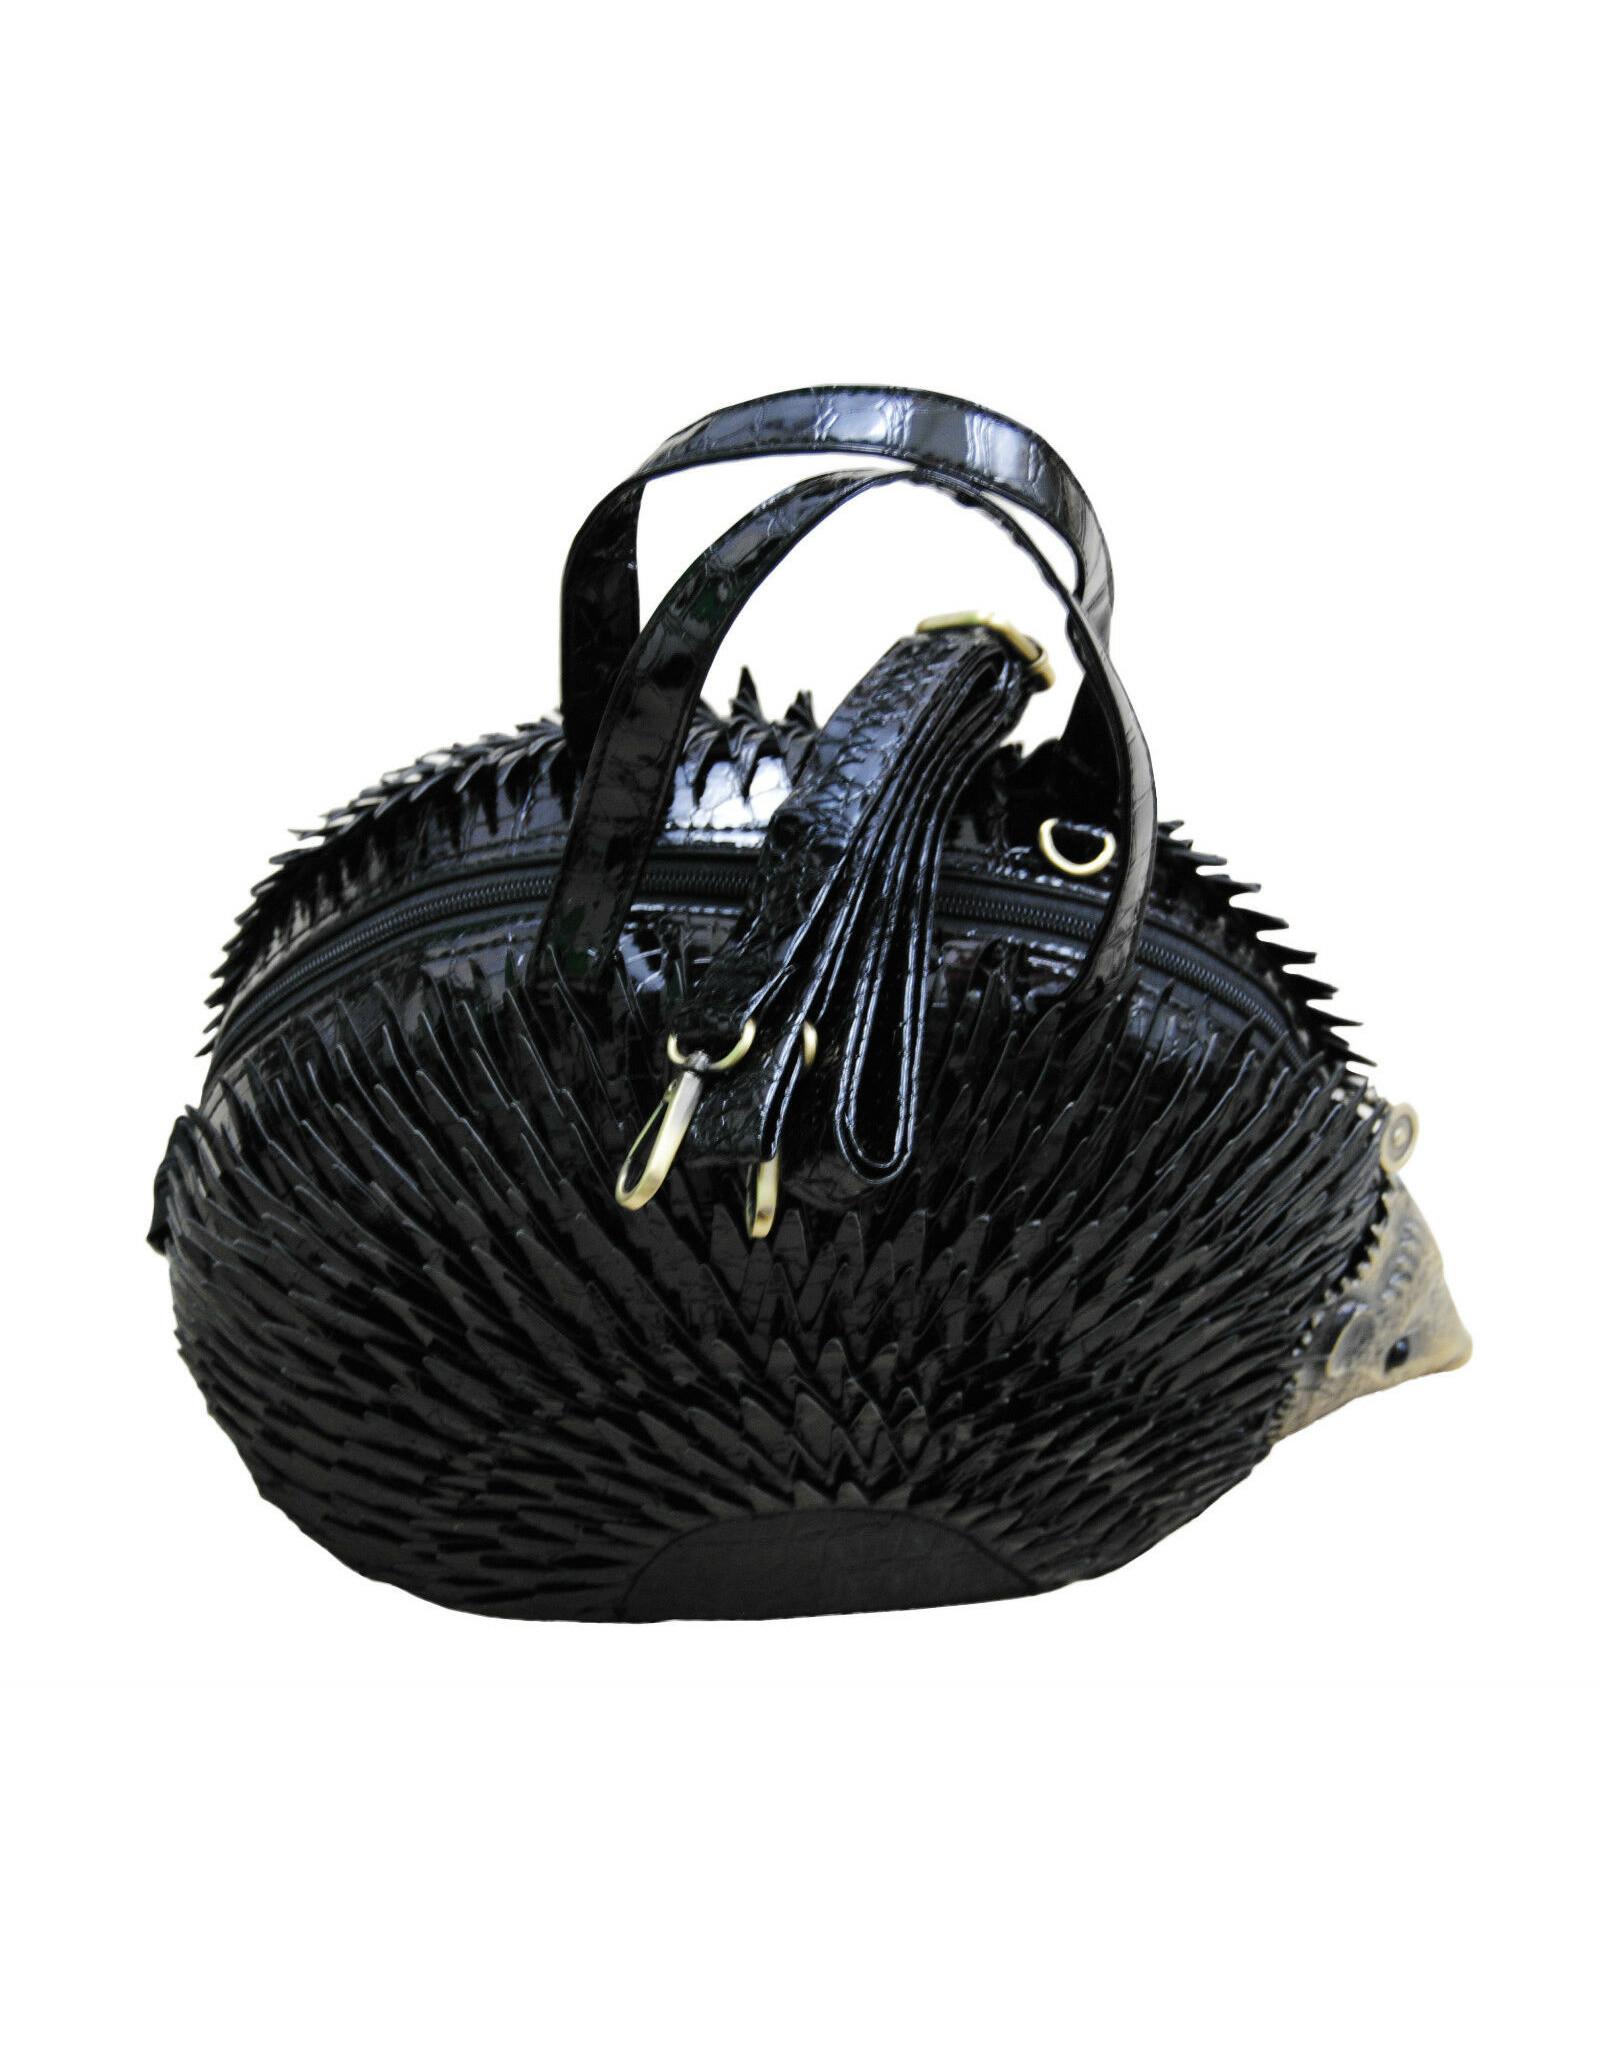 Magic Bags Fantasy bags and wallets - Fantasy handbag  Hedgehog